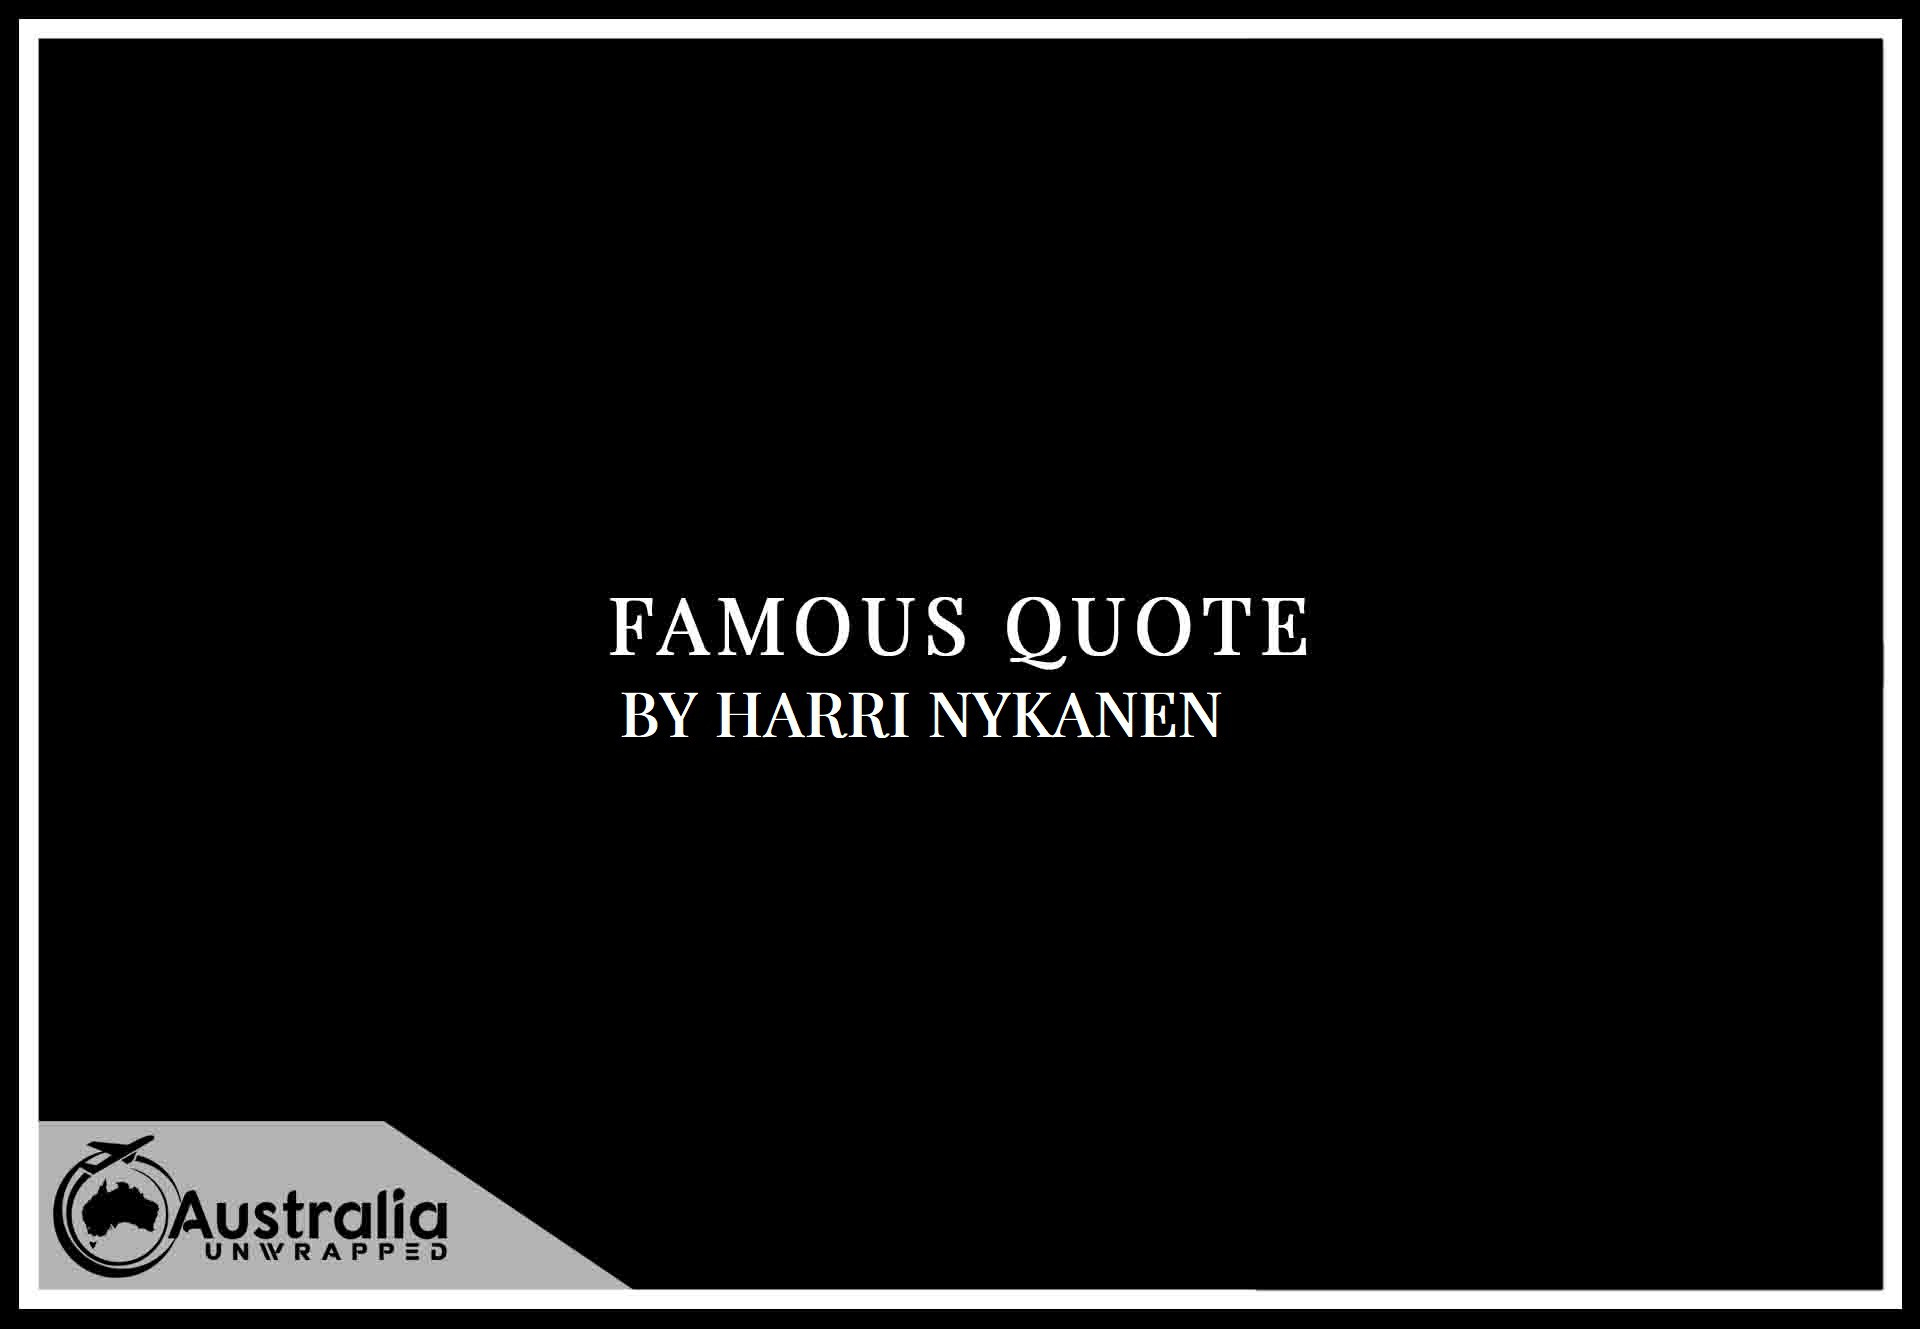 Top 1 Famous Quotes by Author Harri Nykänen